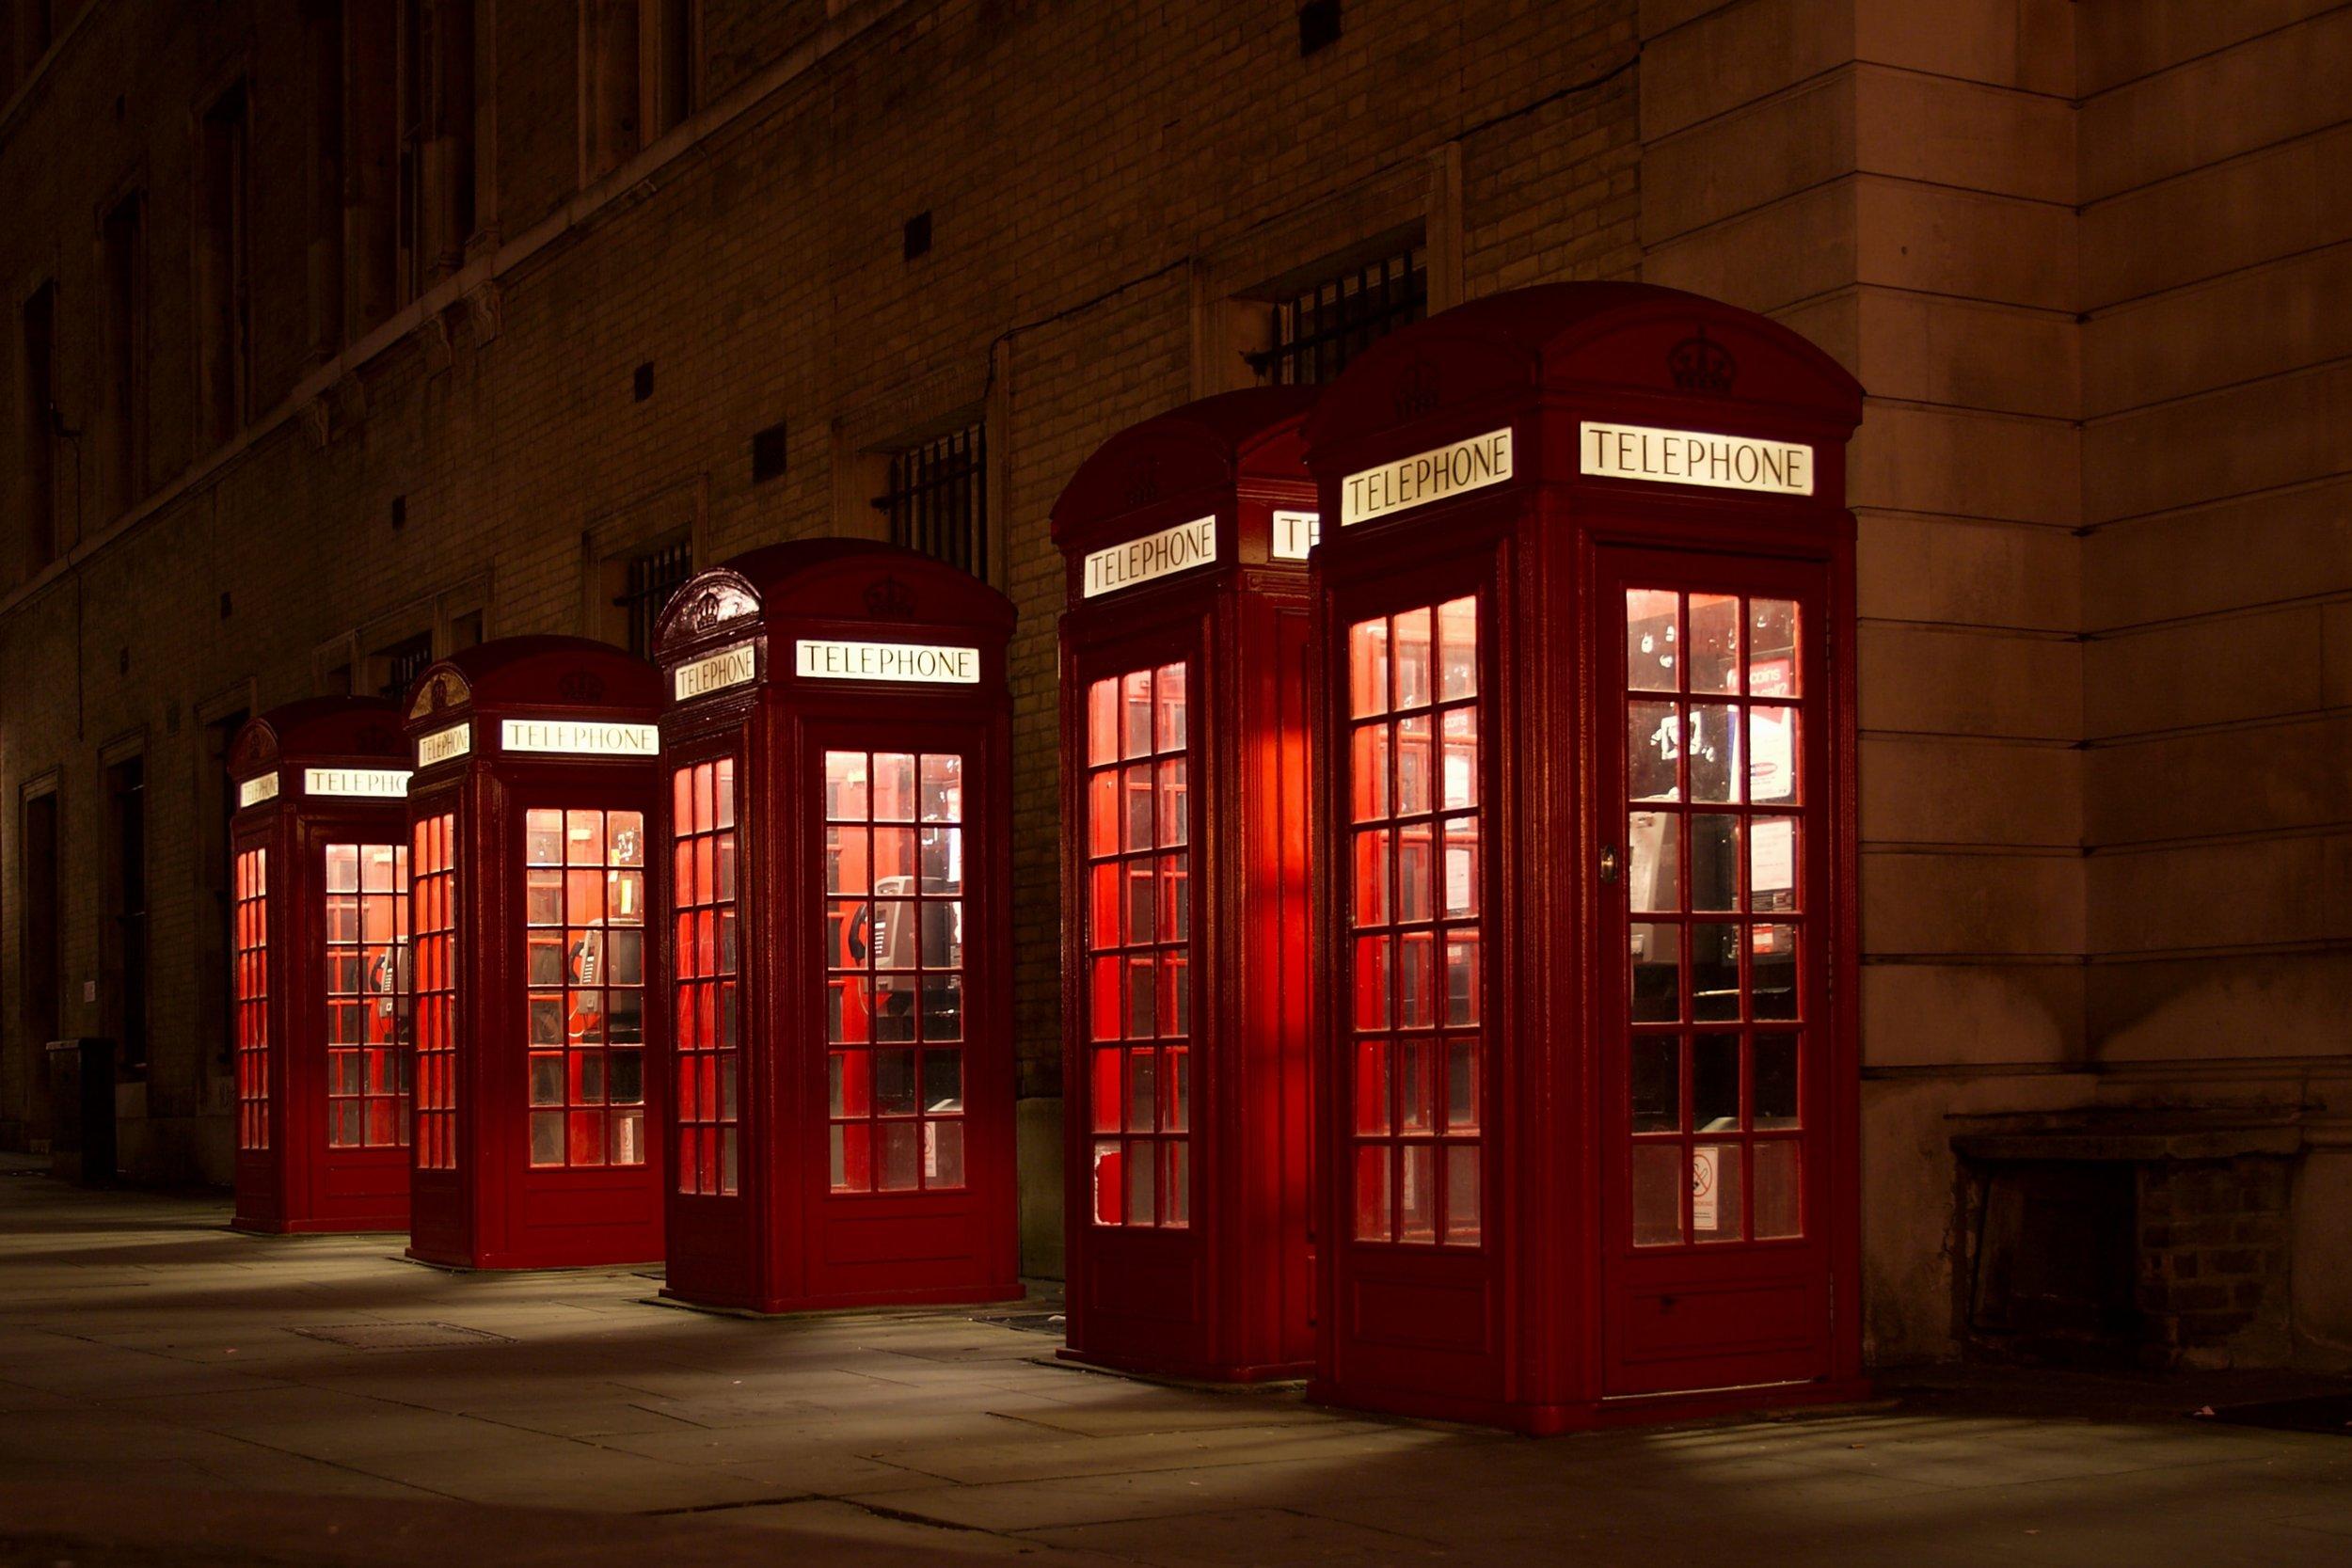 red phone booths.jpg